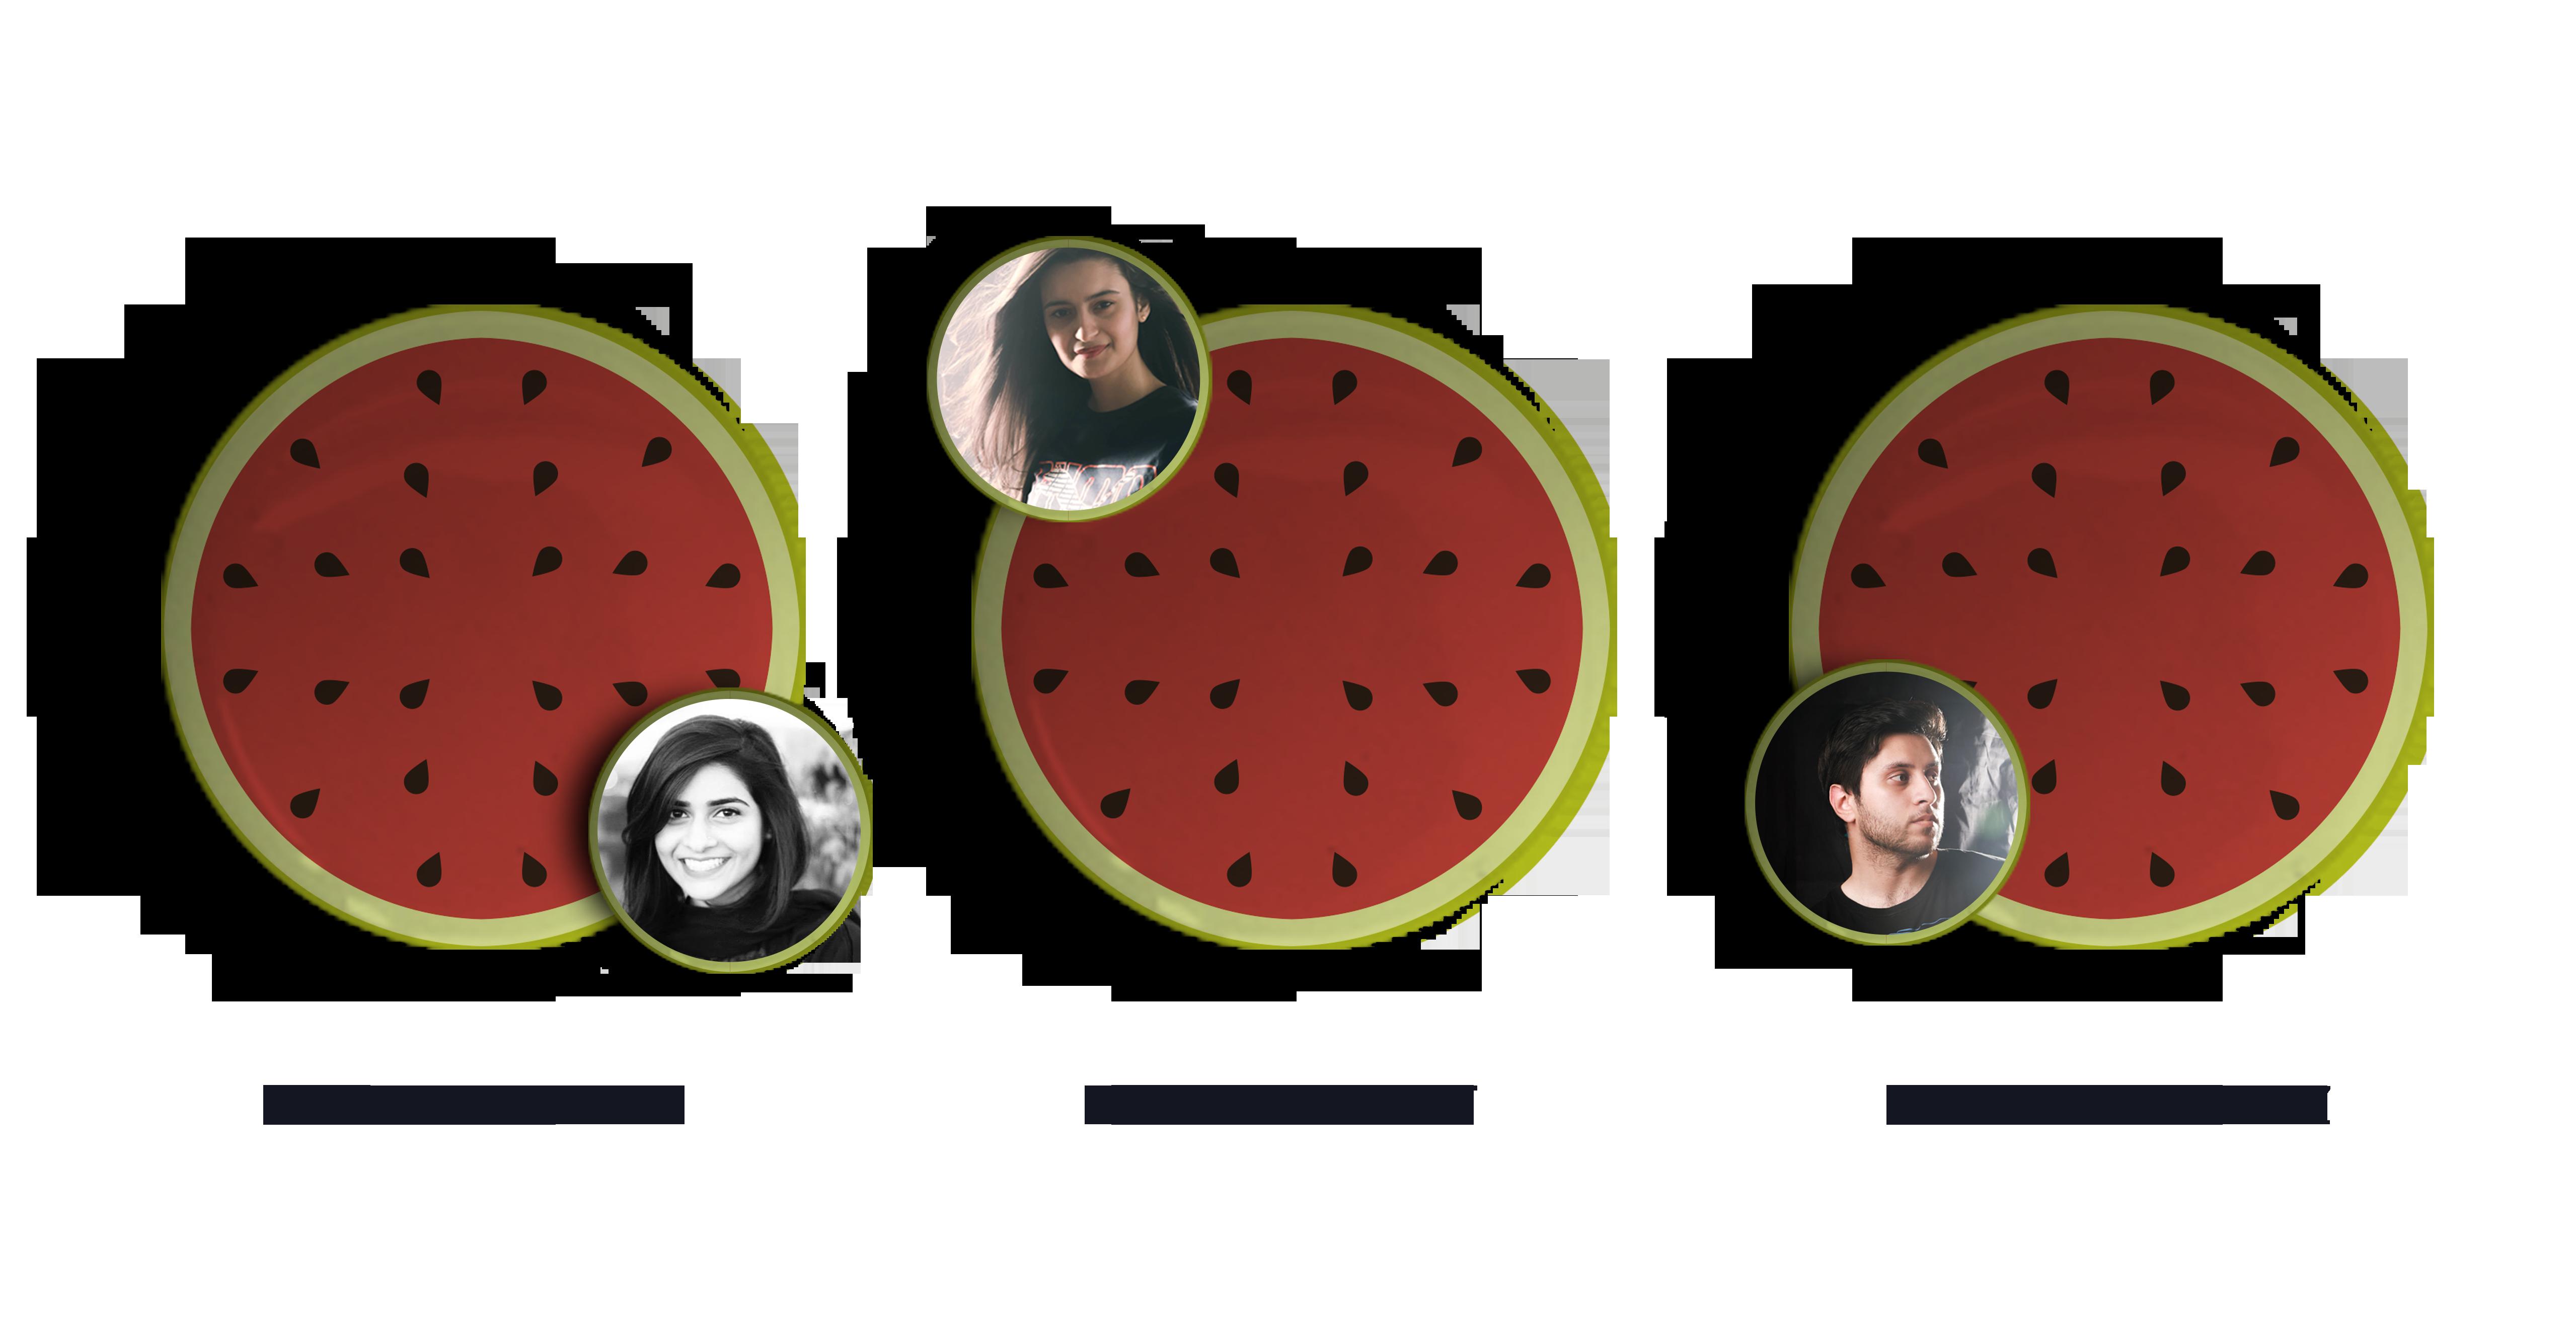 About miss krao lahoriyo. Watermelon clipart tarbooz